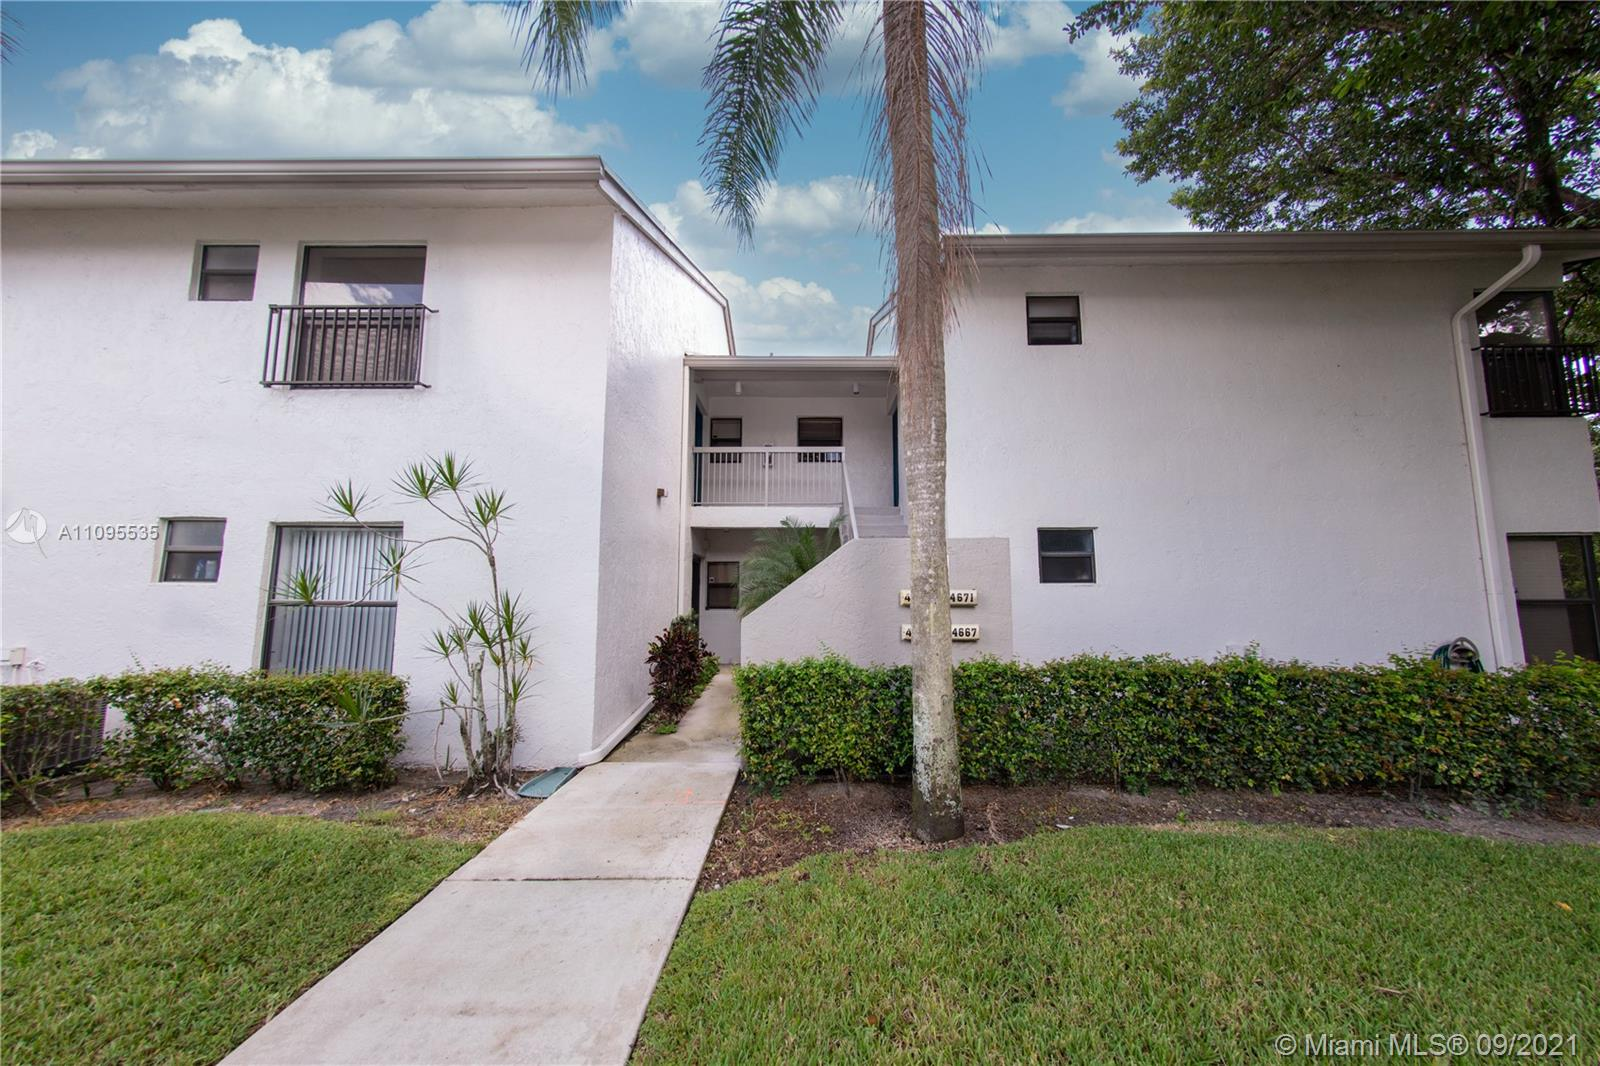 4672 22nd St Unit 4222, Coconut Creek, Florida 33063